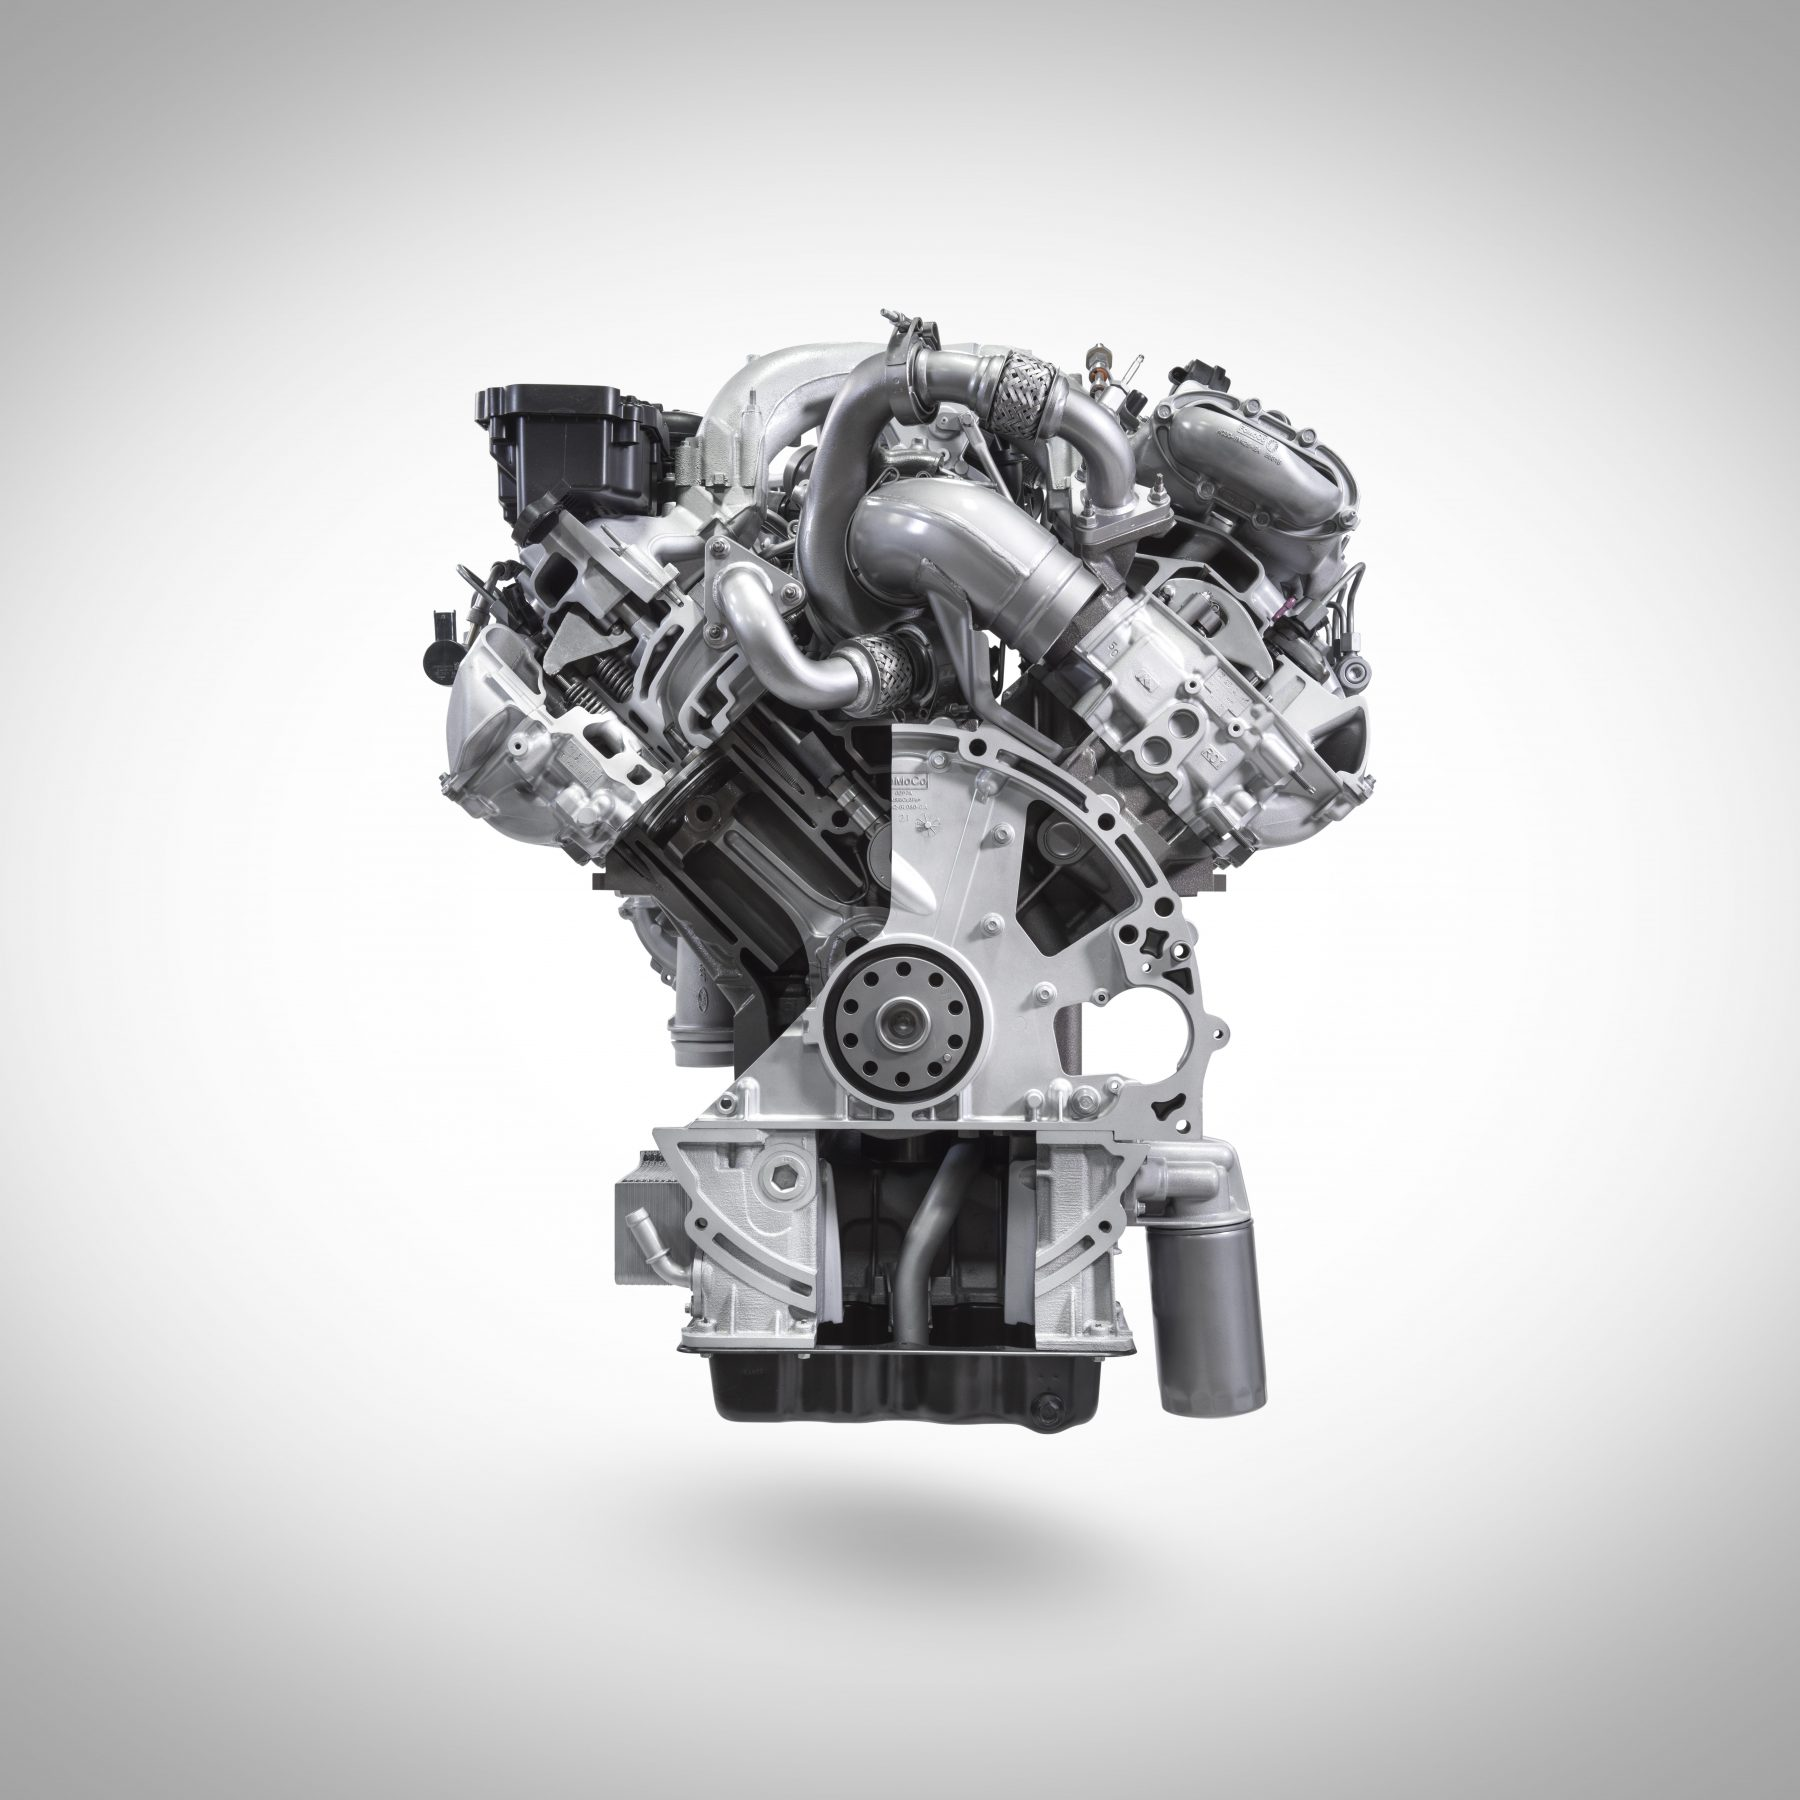 6.7l Powerstroke Diesel Engine